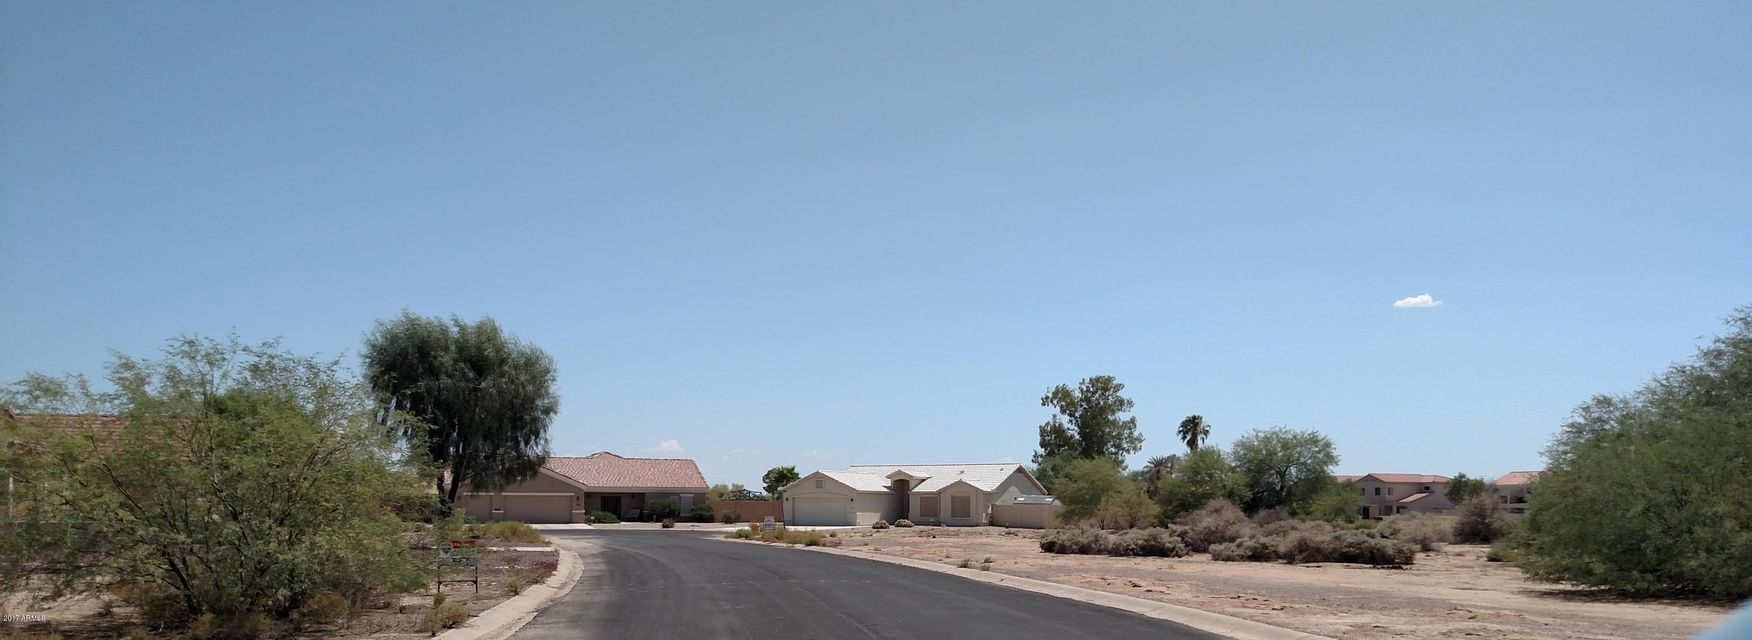 15115 S INDIAN BEND Lane Arizona City, AZ 85123 - MLS #: 5632822